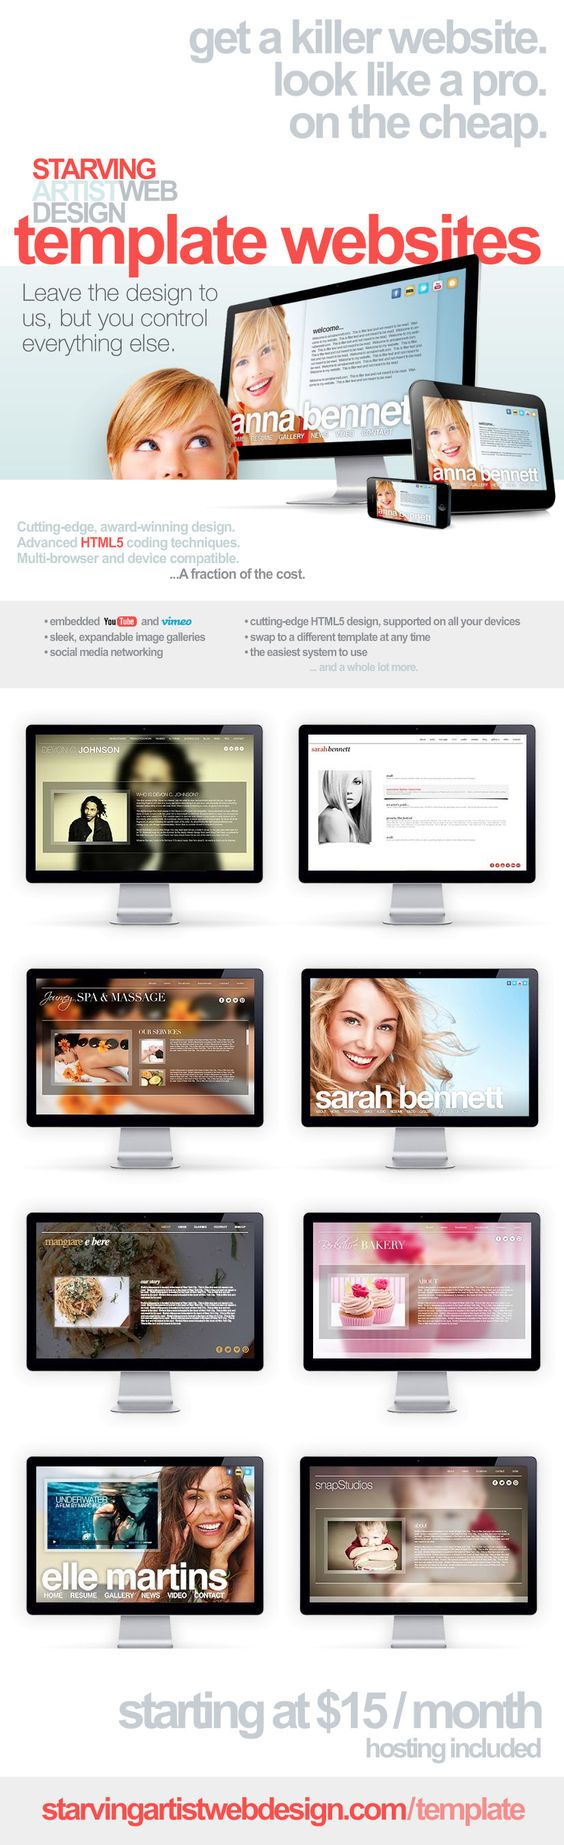 Template Websites from Starving Artist Web Design